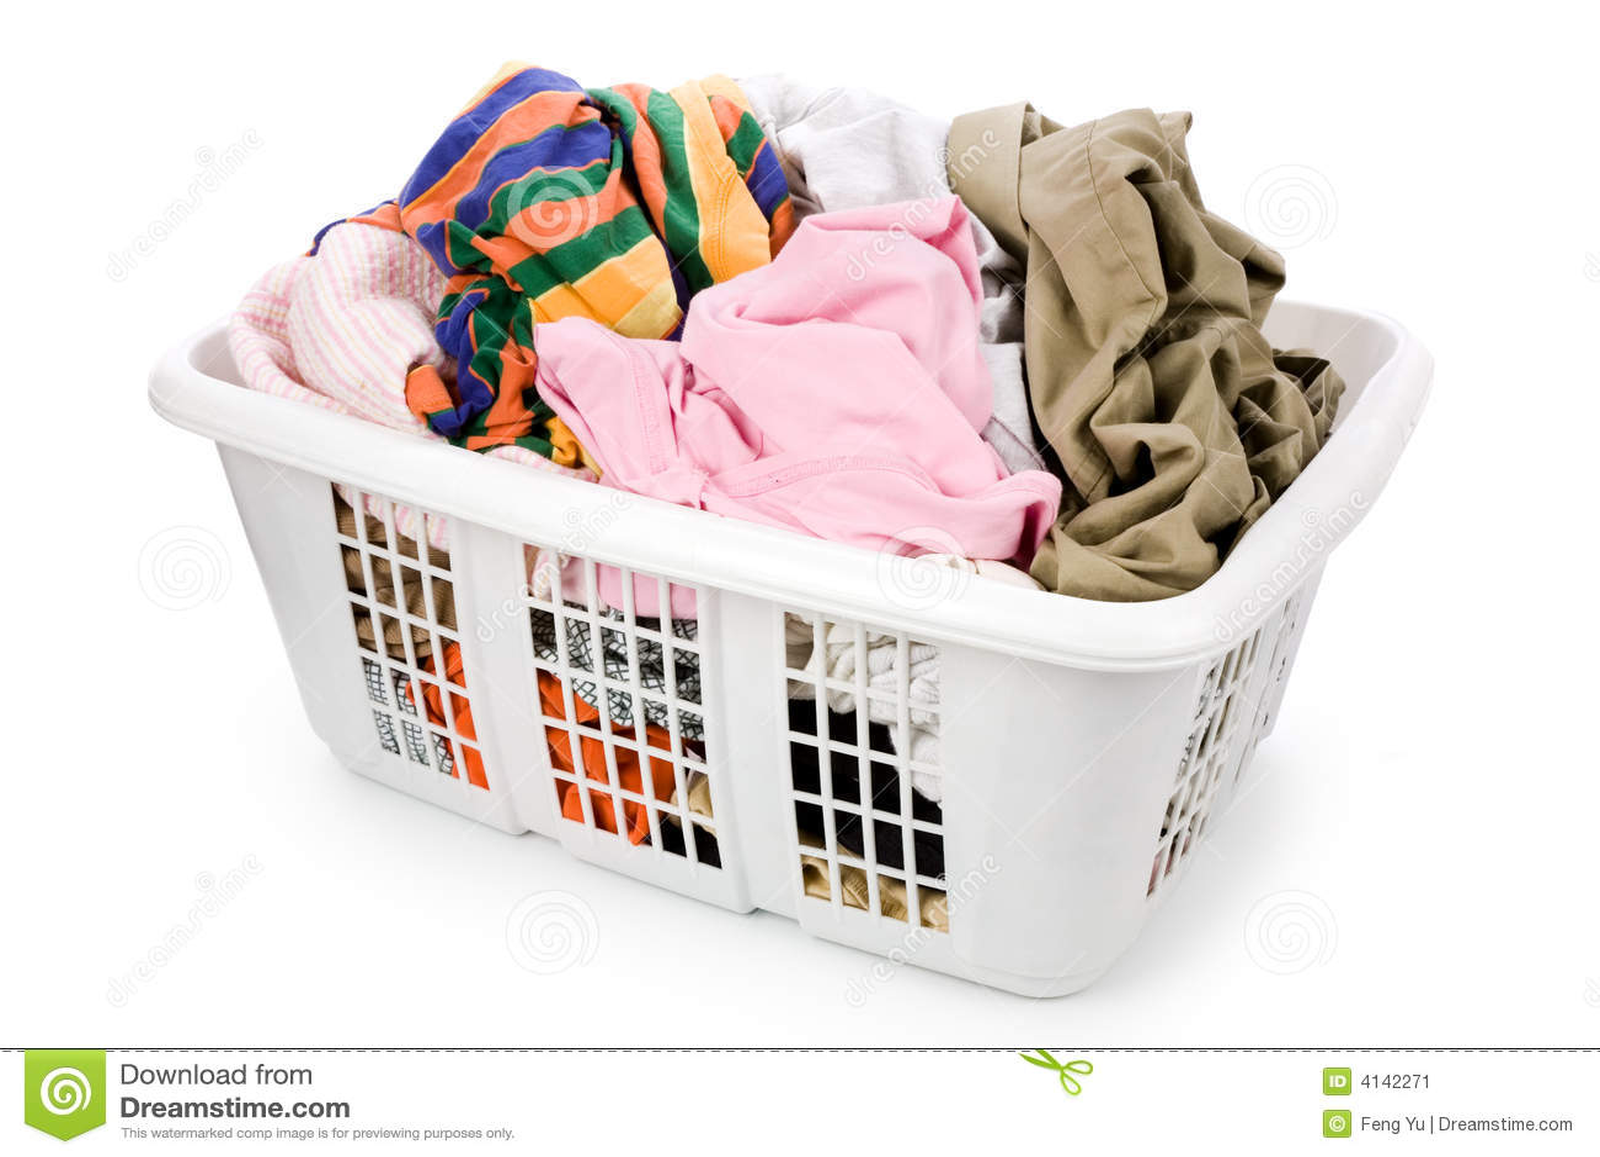 Laundry Basket And Dirty Clothing Stock Image - Image: 4142271